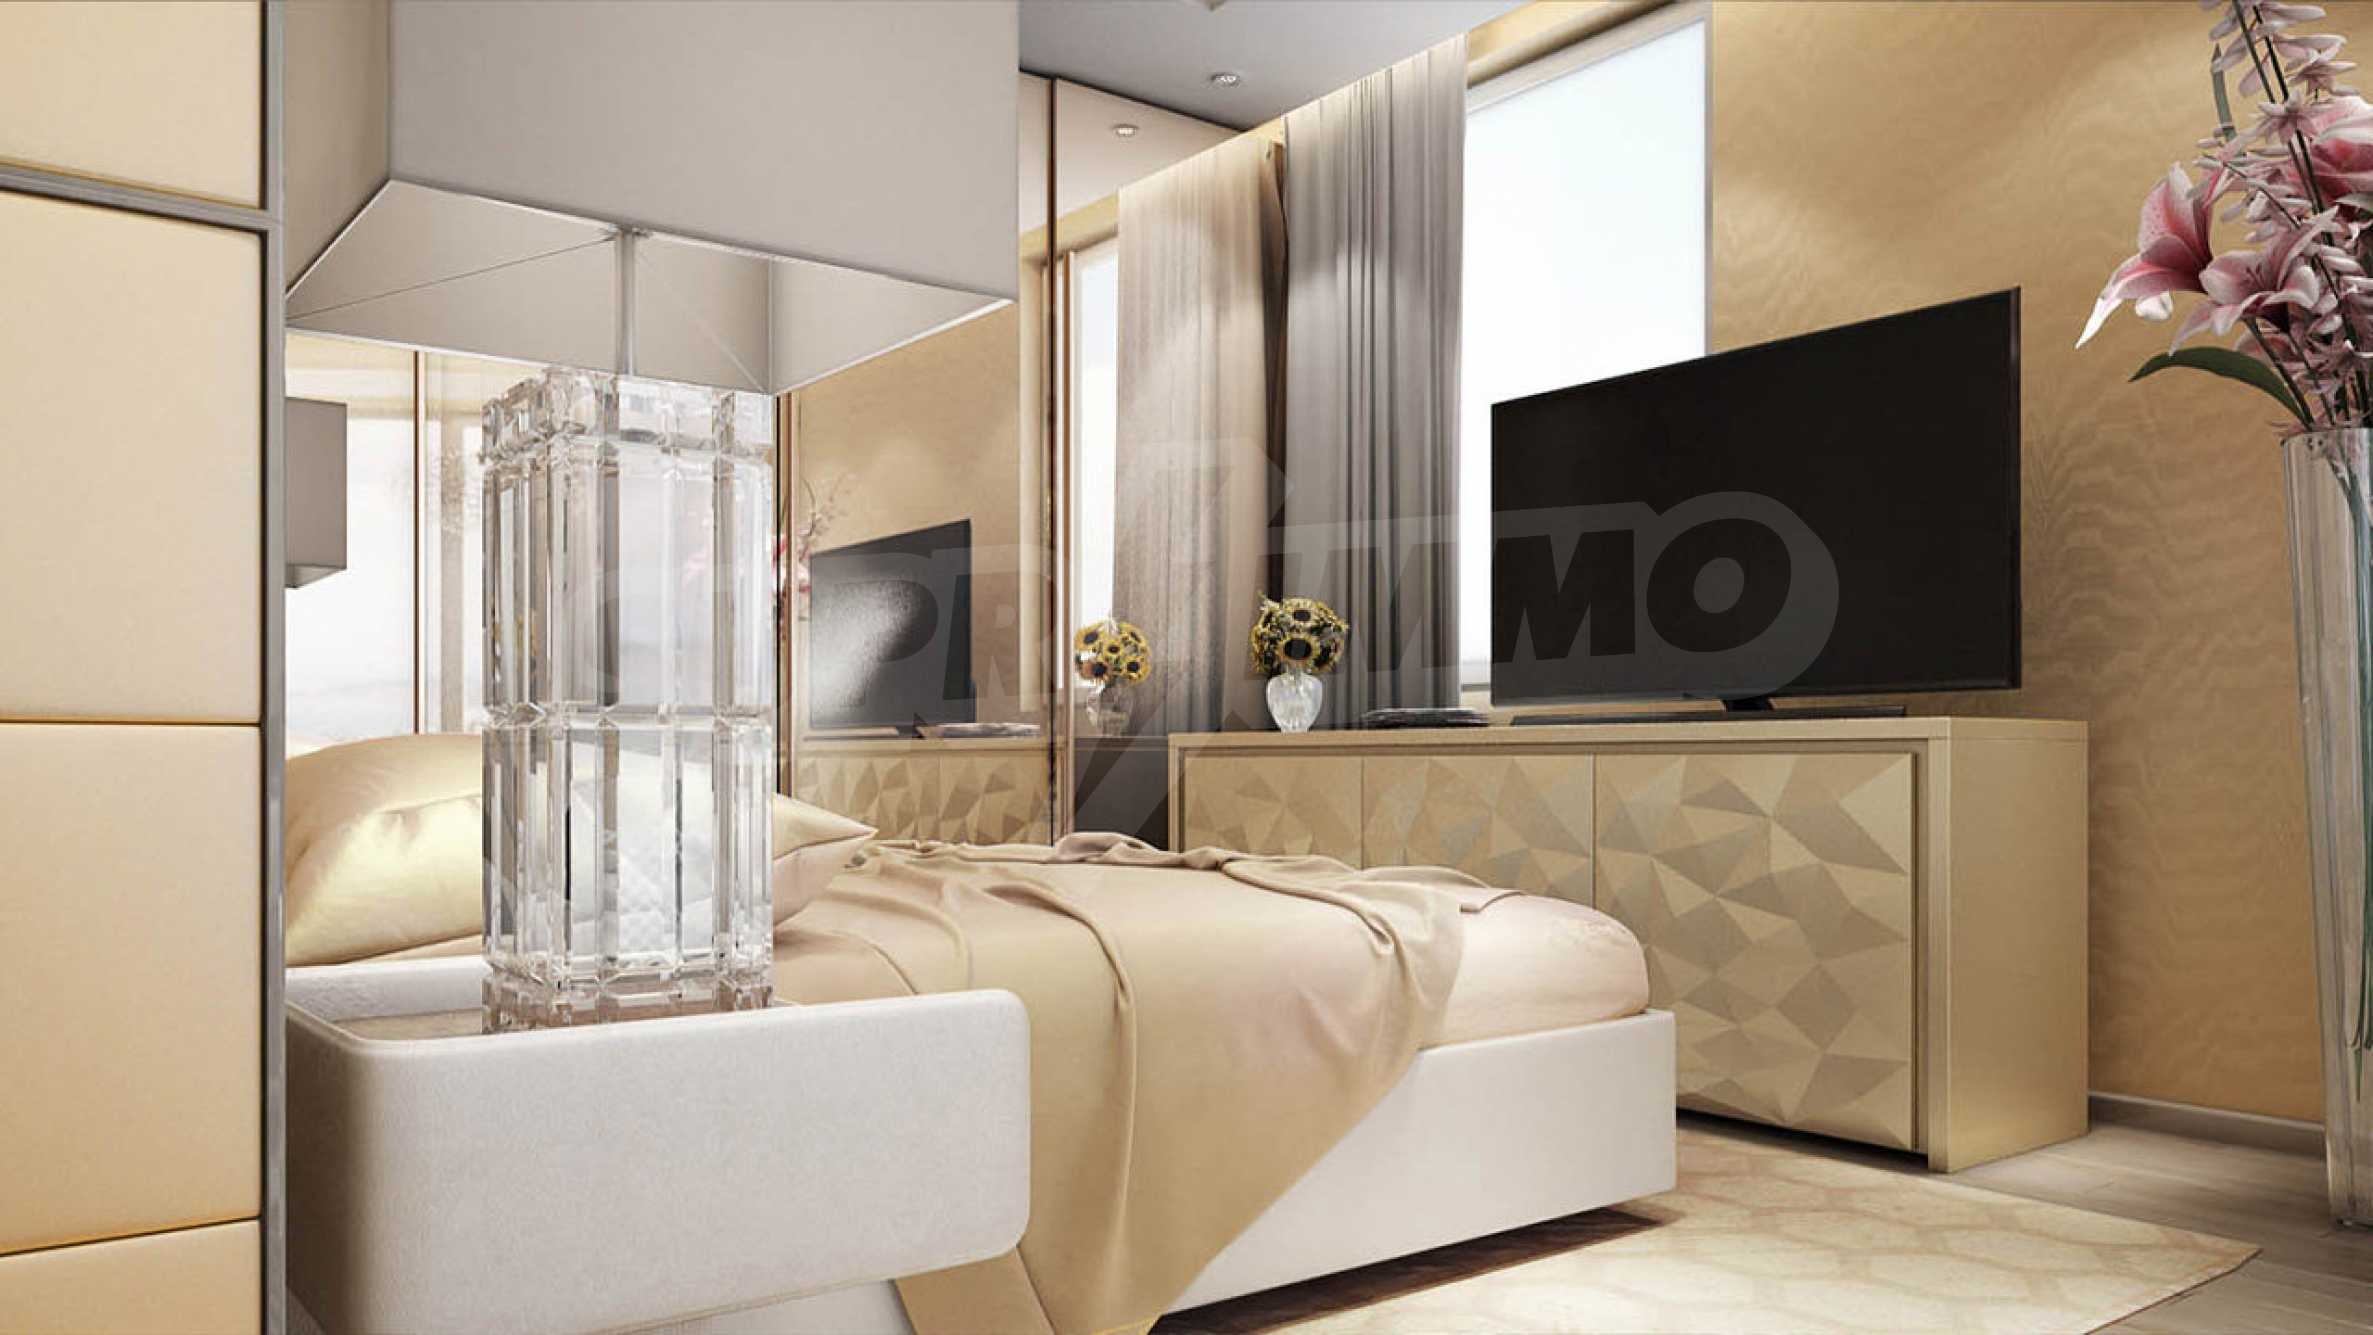 Нова сграда с луксозни апартаменти в гр. Бургас 15